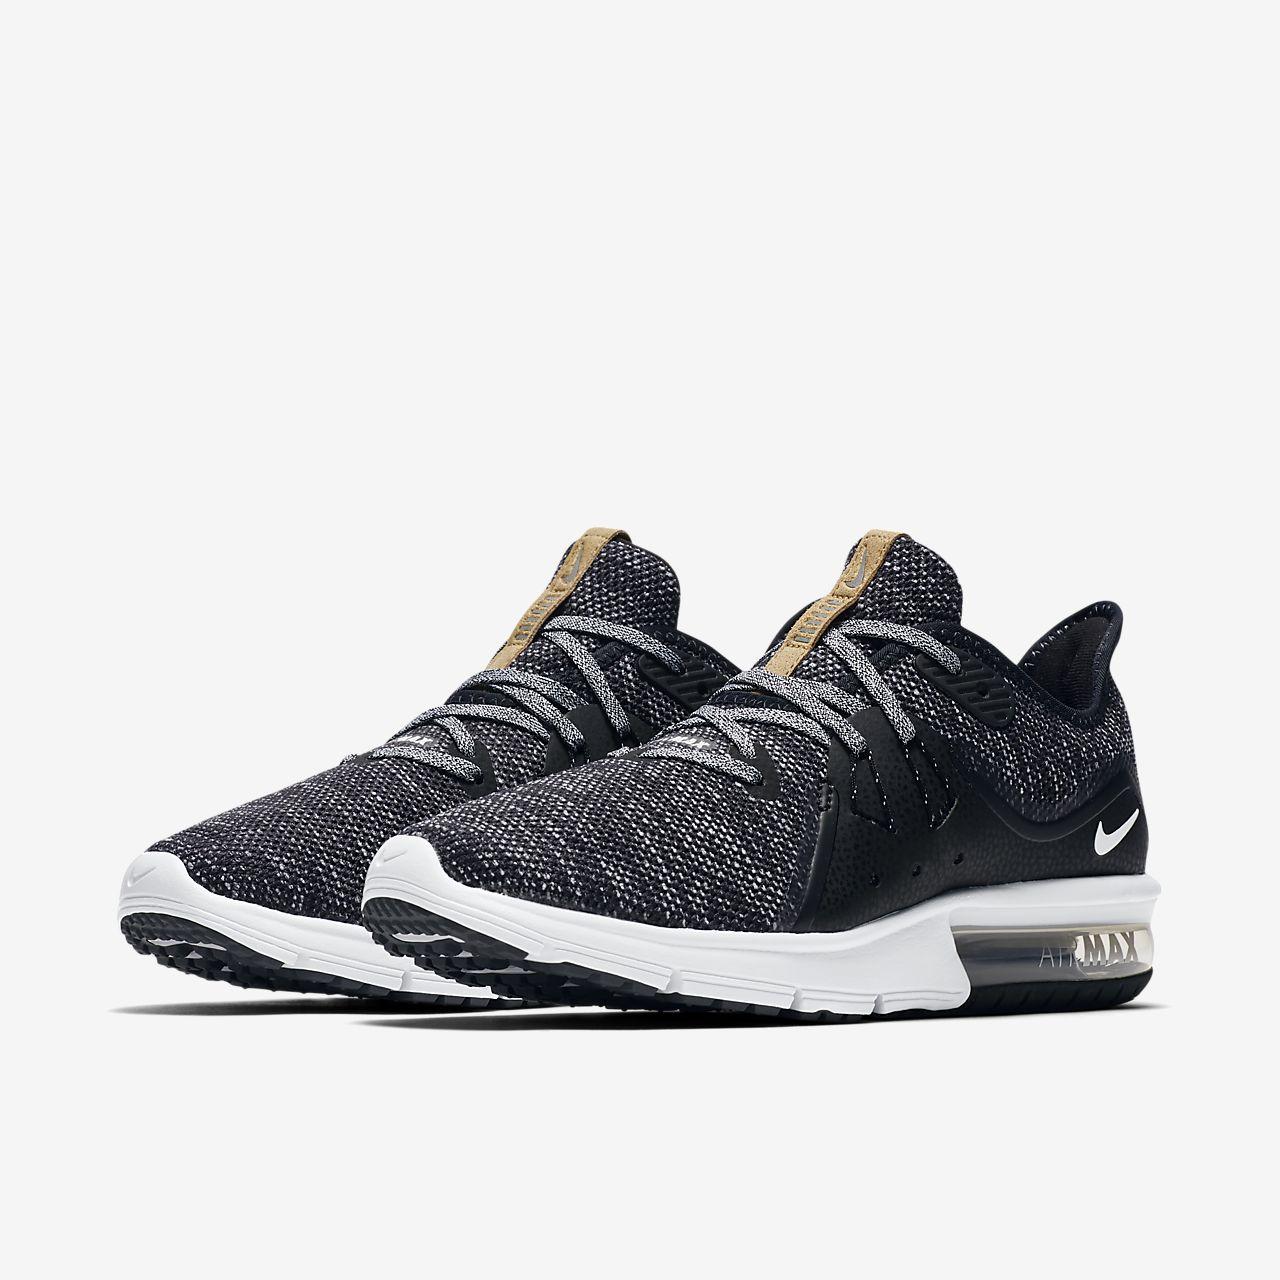 ... Chaussure de running Nike Air Max Sequent 3 pour Femme